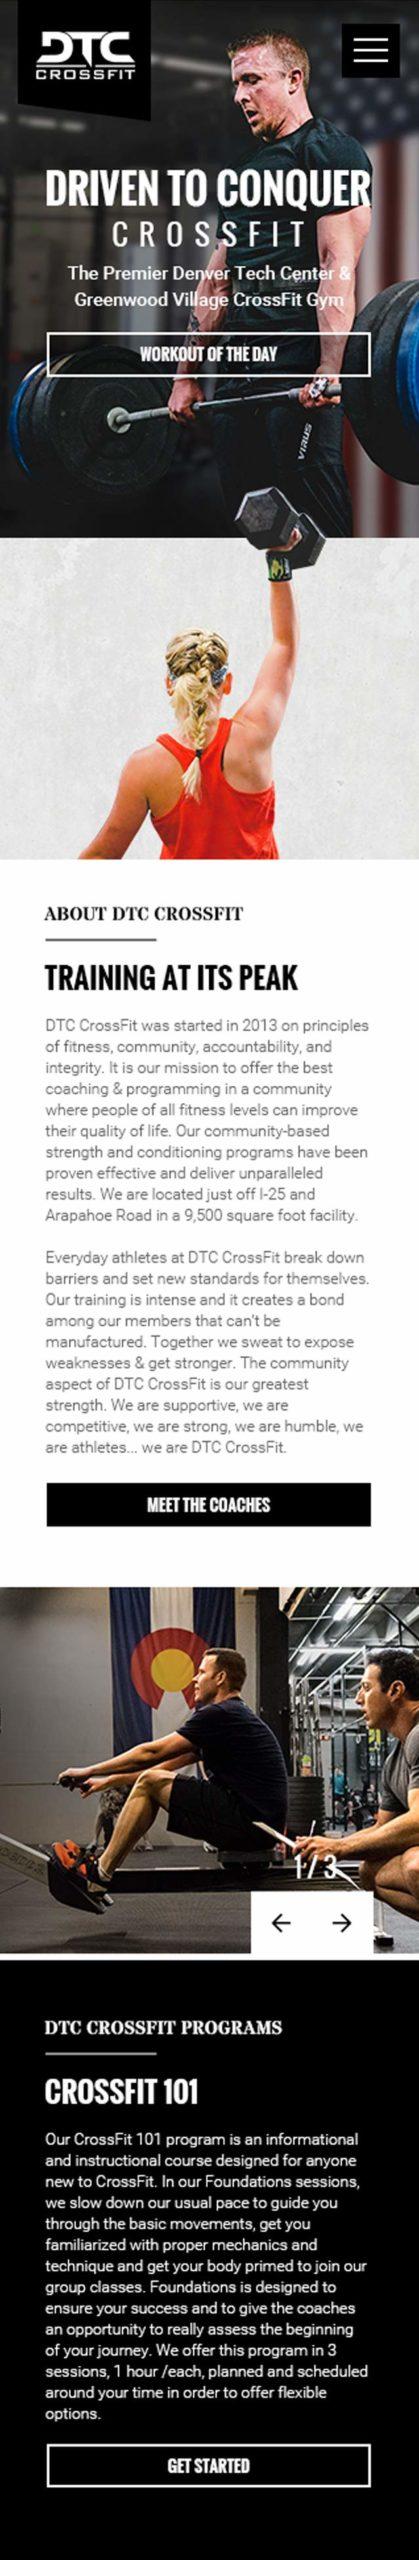 DTC Crossfit